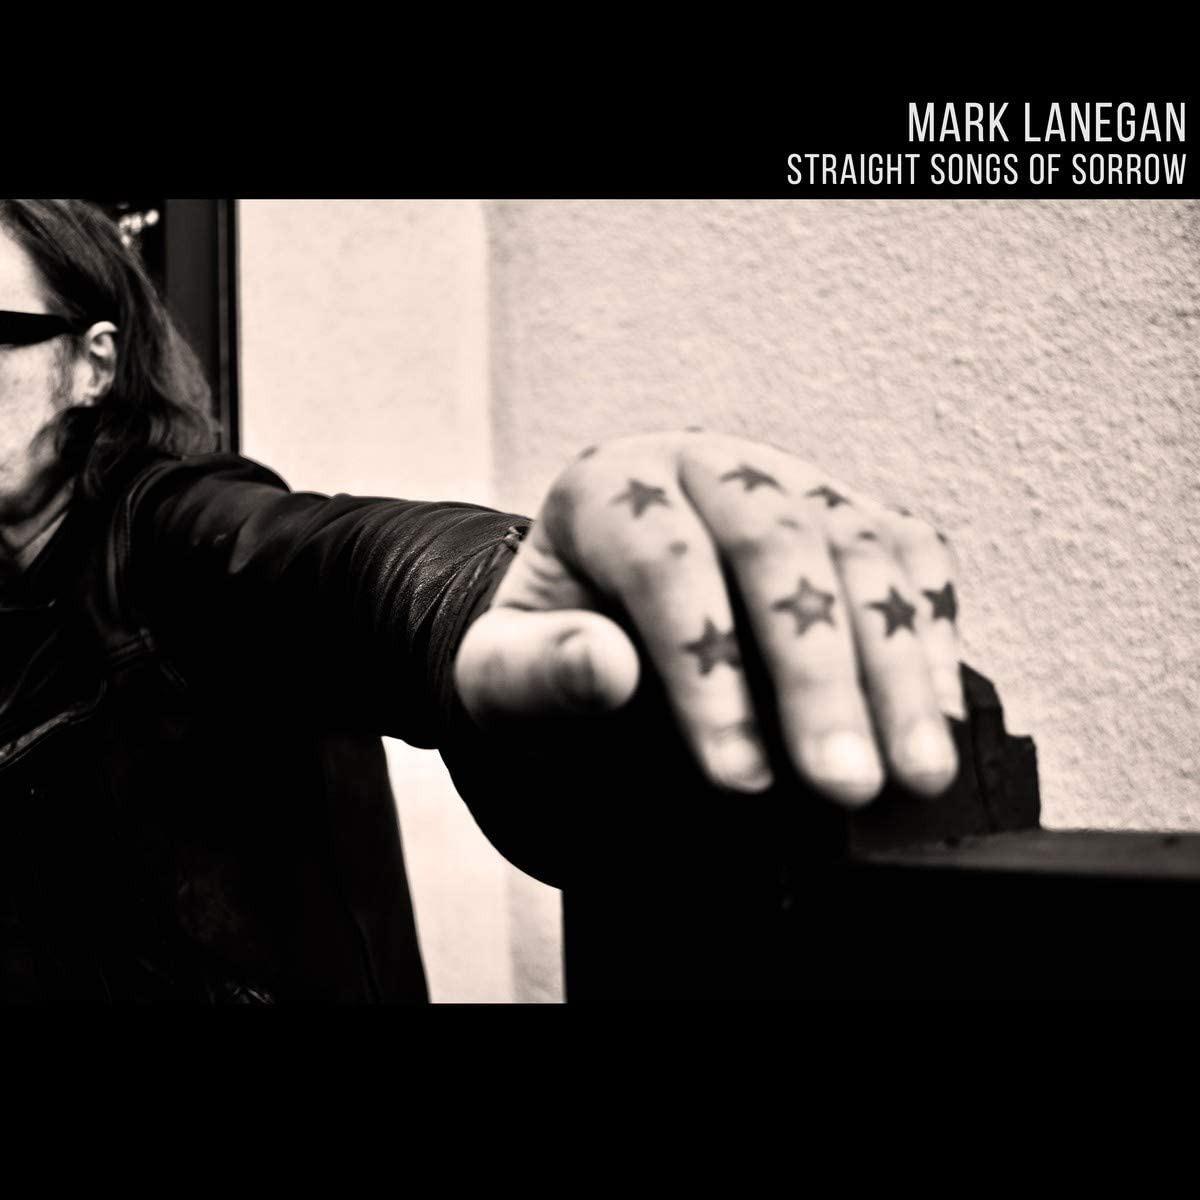 ALBUM REVIEW: Mark Lanegan - Straight Songs of Sorrow